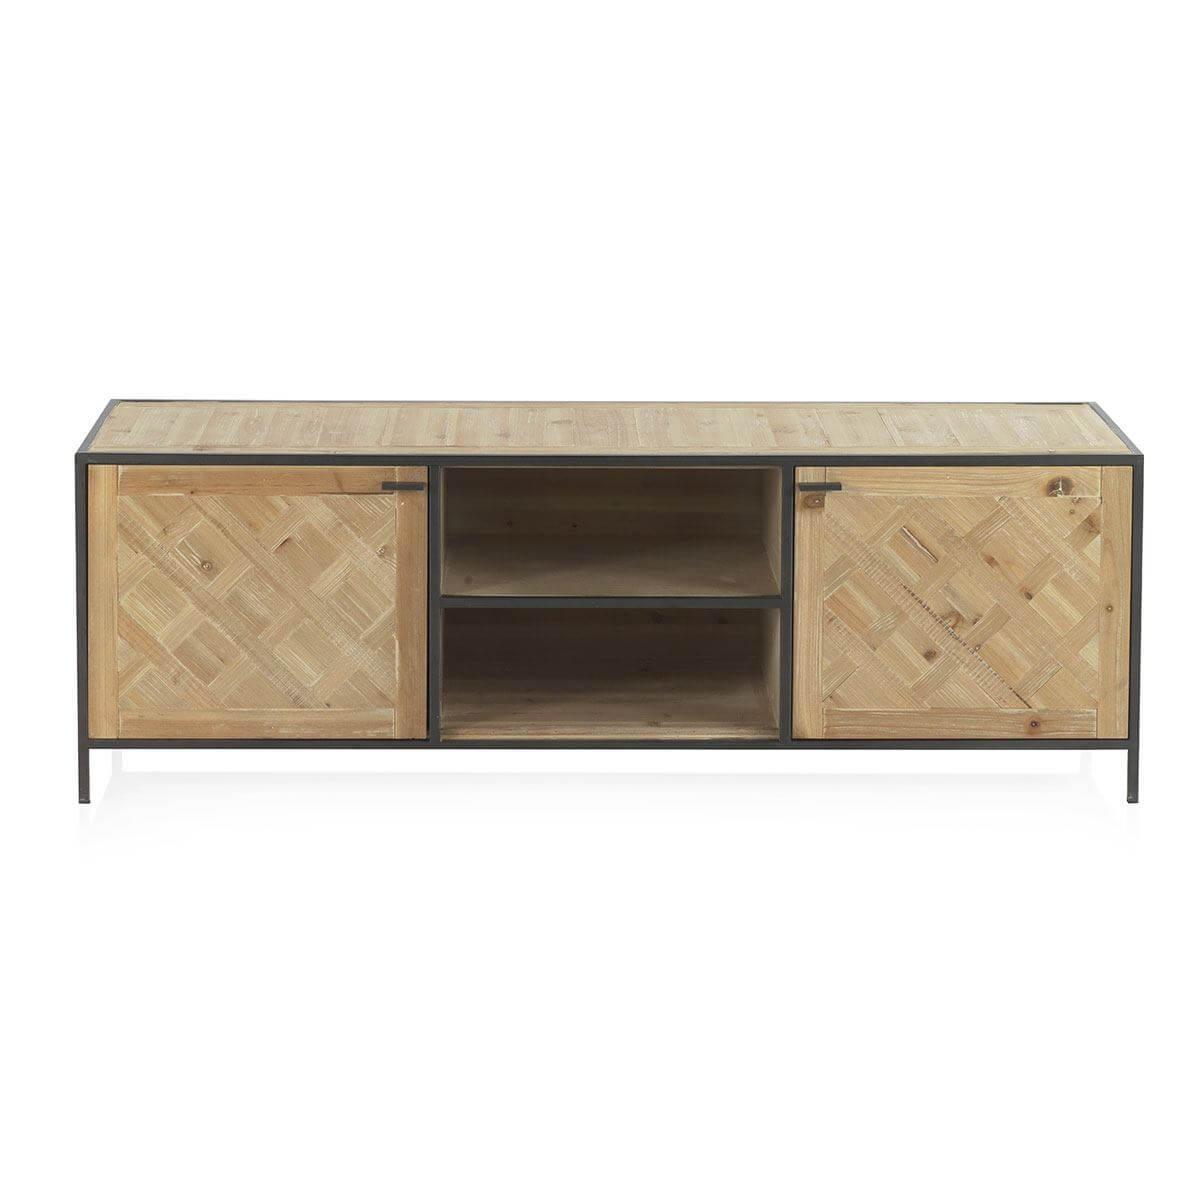 Mueble TV hierro y madera natural Artikalia